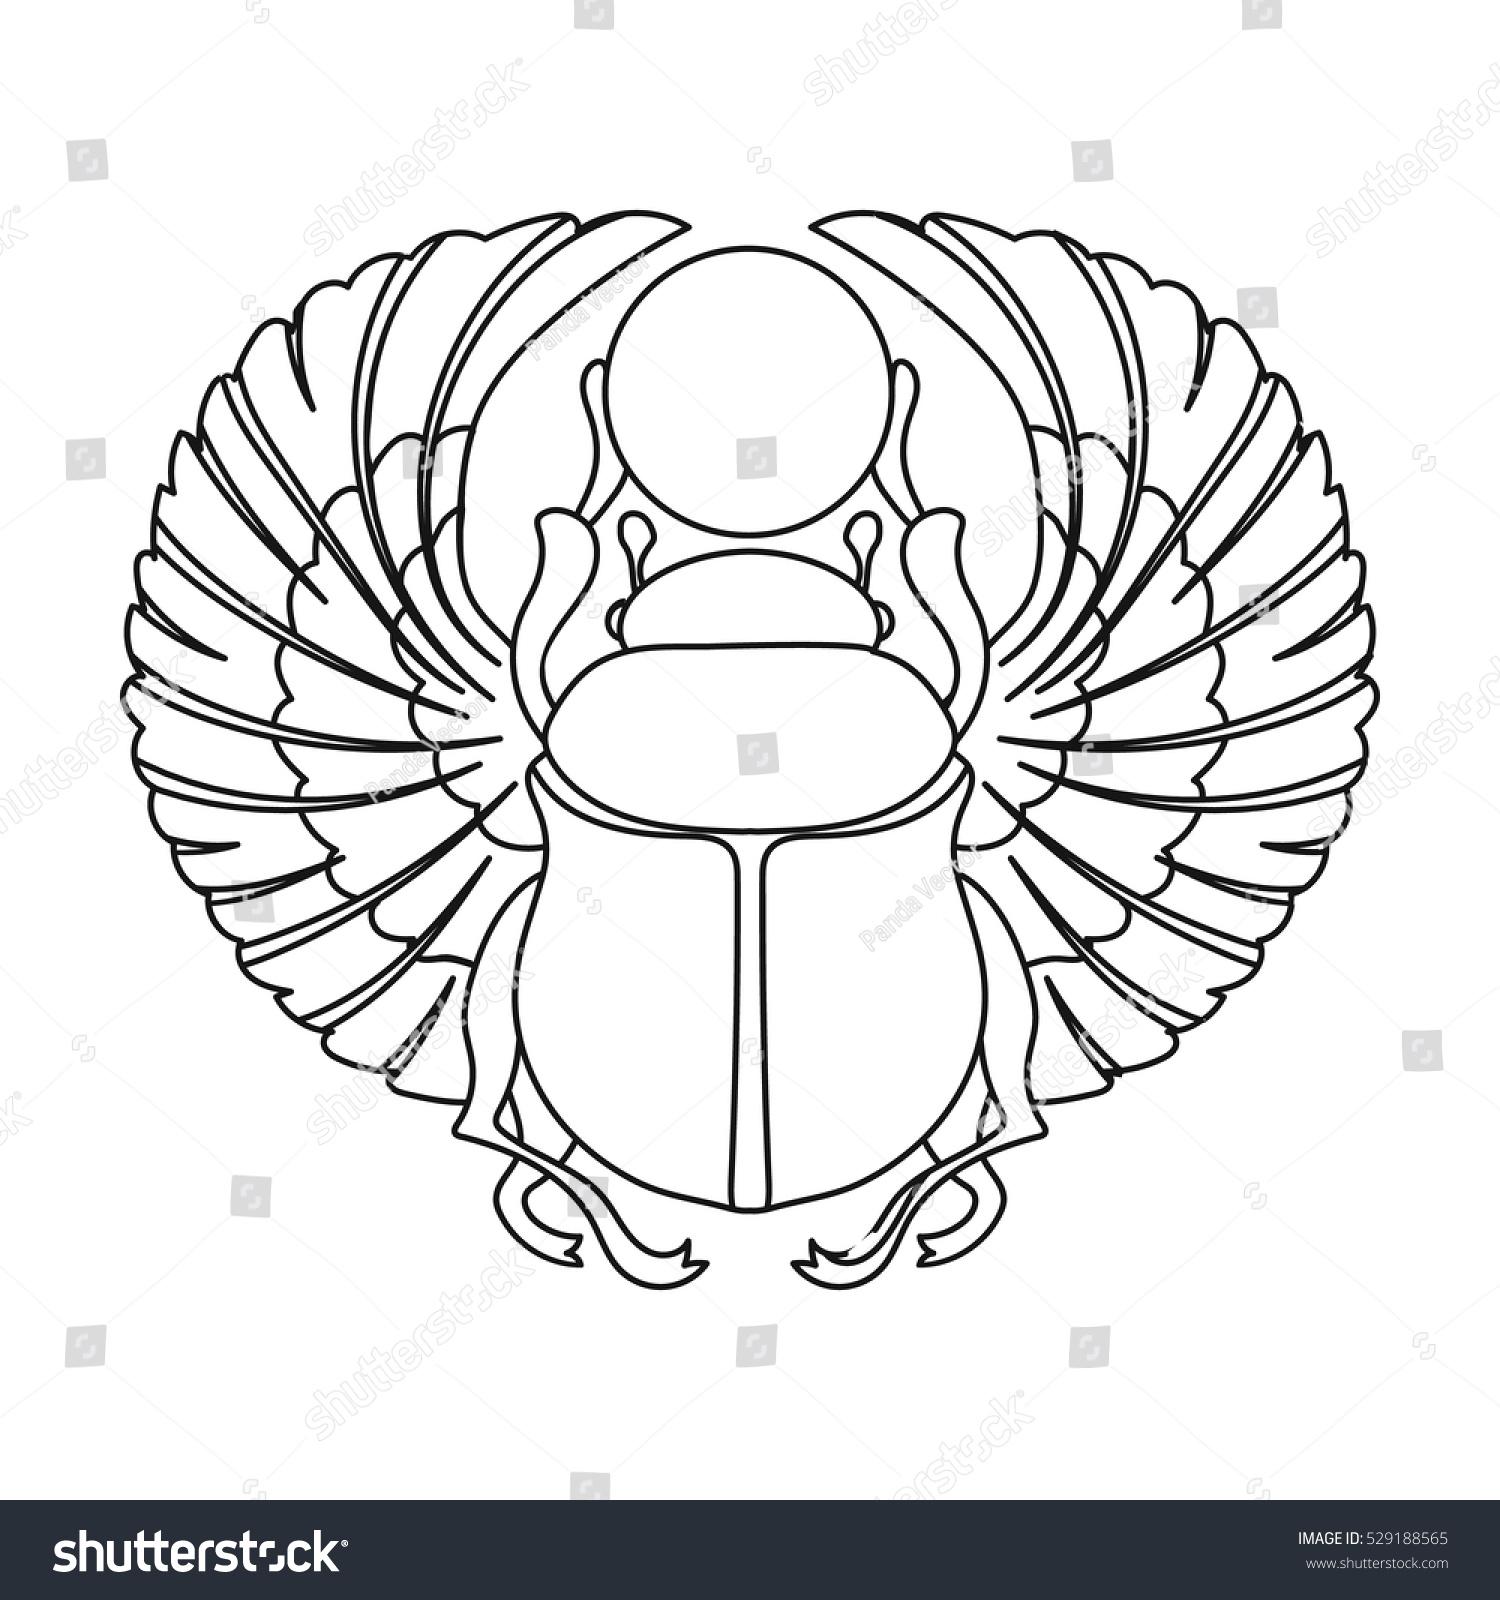 Scarab icon outline style isolated on stock vector 529188565 scarab icon in outline style isolated on white background ancient egypt symbol stock vector illustration buycottarizona